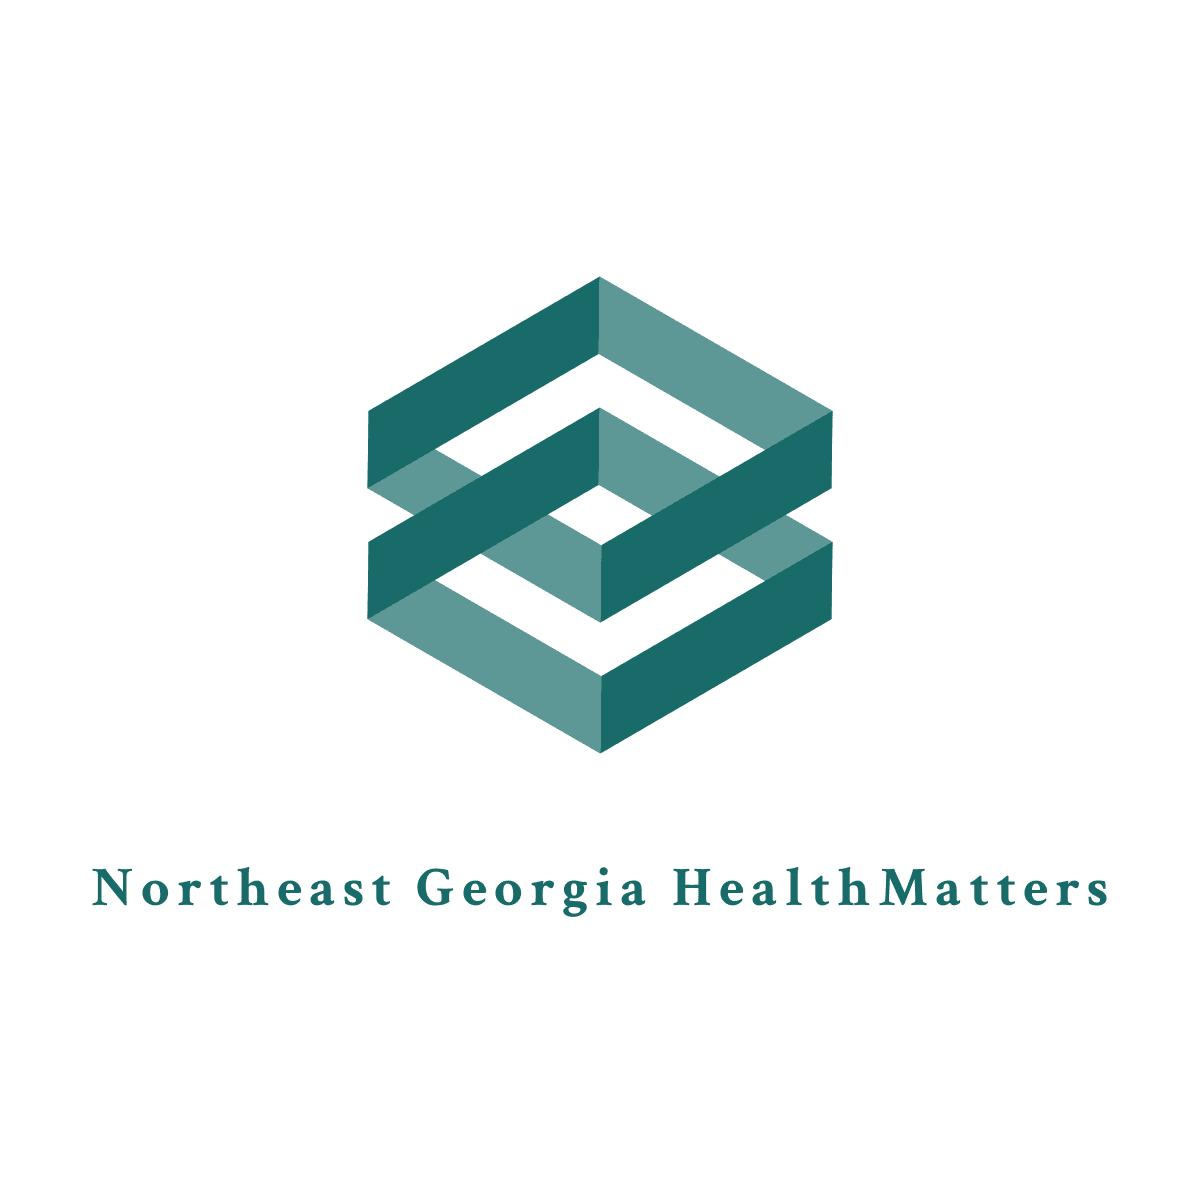 Northeast Georgia Health Matters